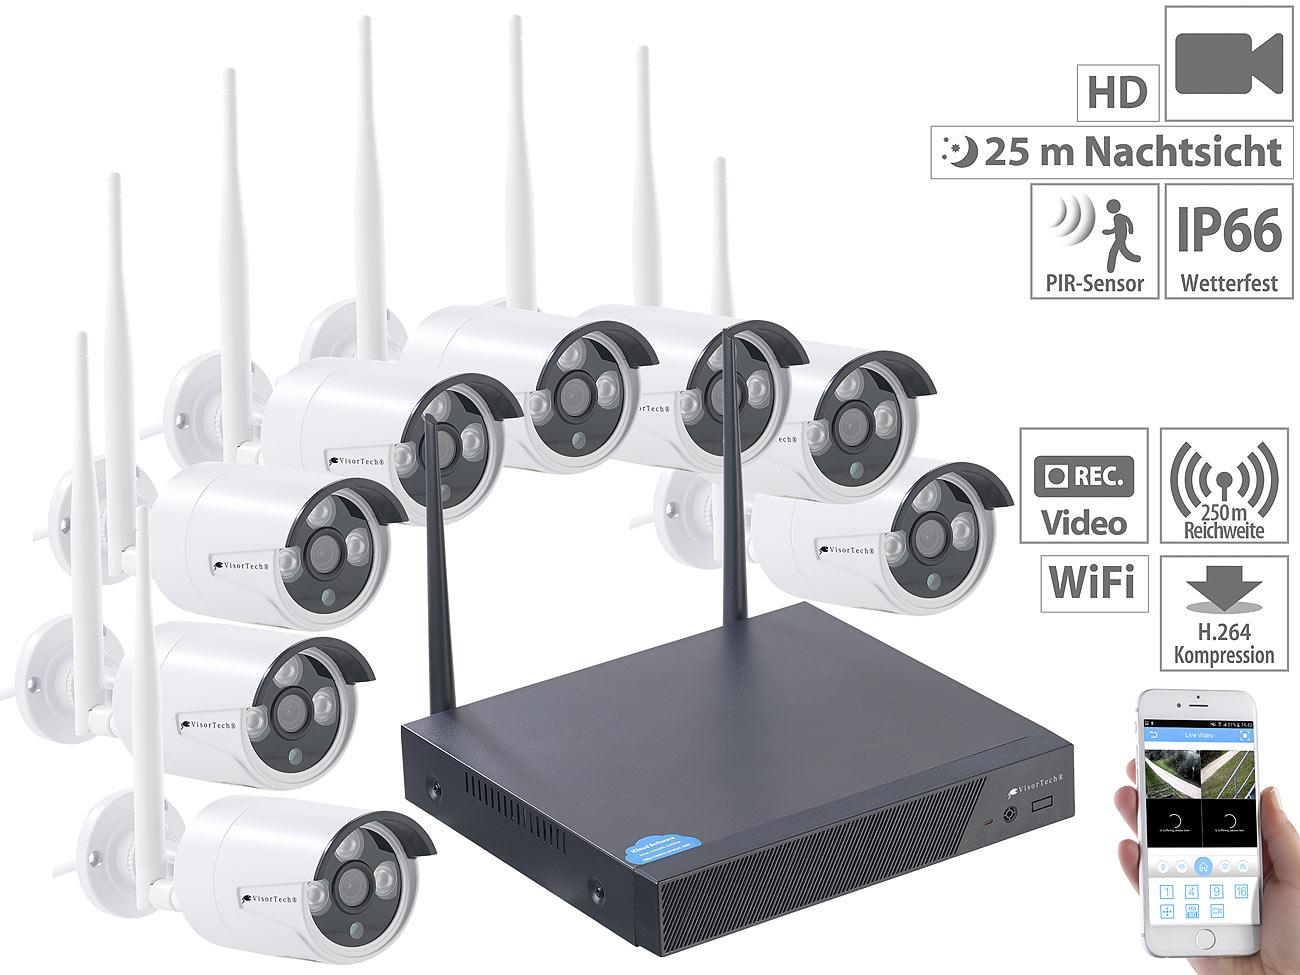 VisorTech Funk-Überwachungssystem DSC-745.PnP, HDD-Recorder & 8 IPKameras, Plug & Play, www.pearl.de